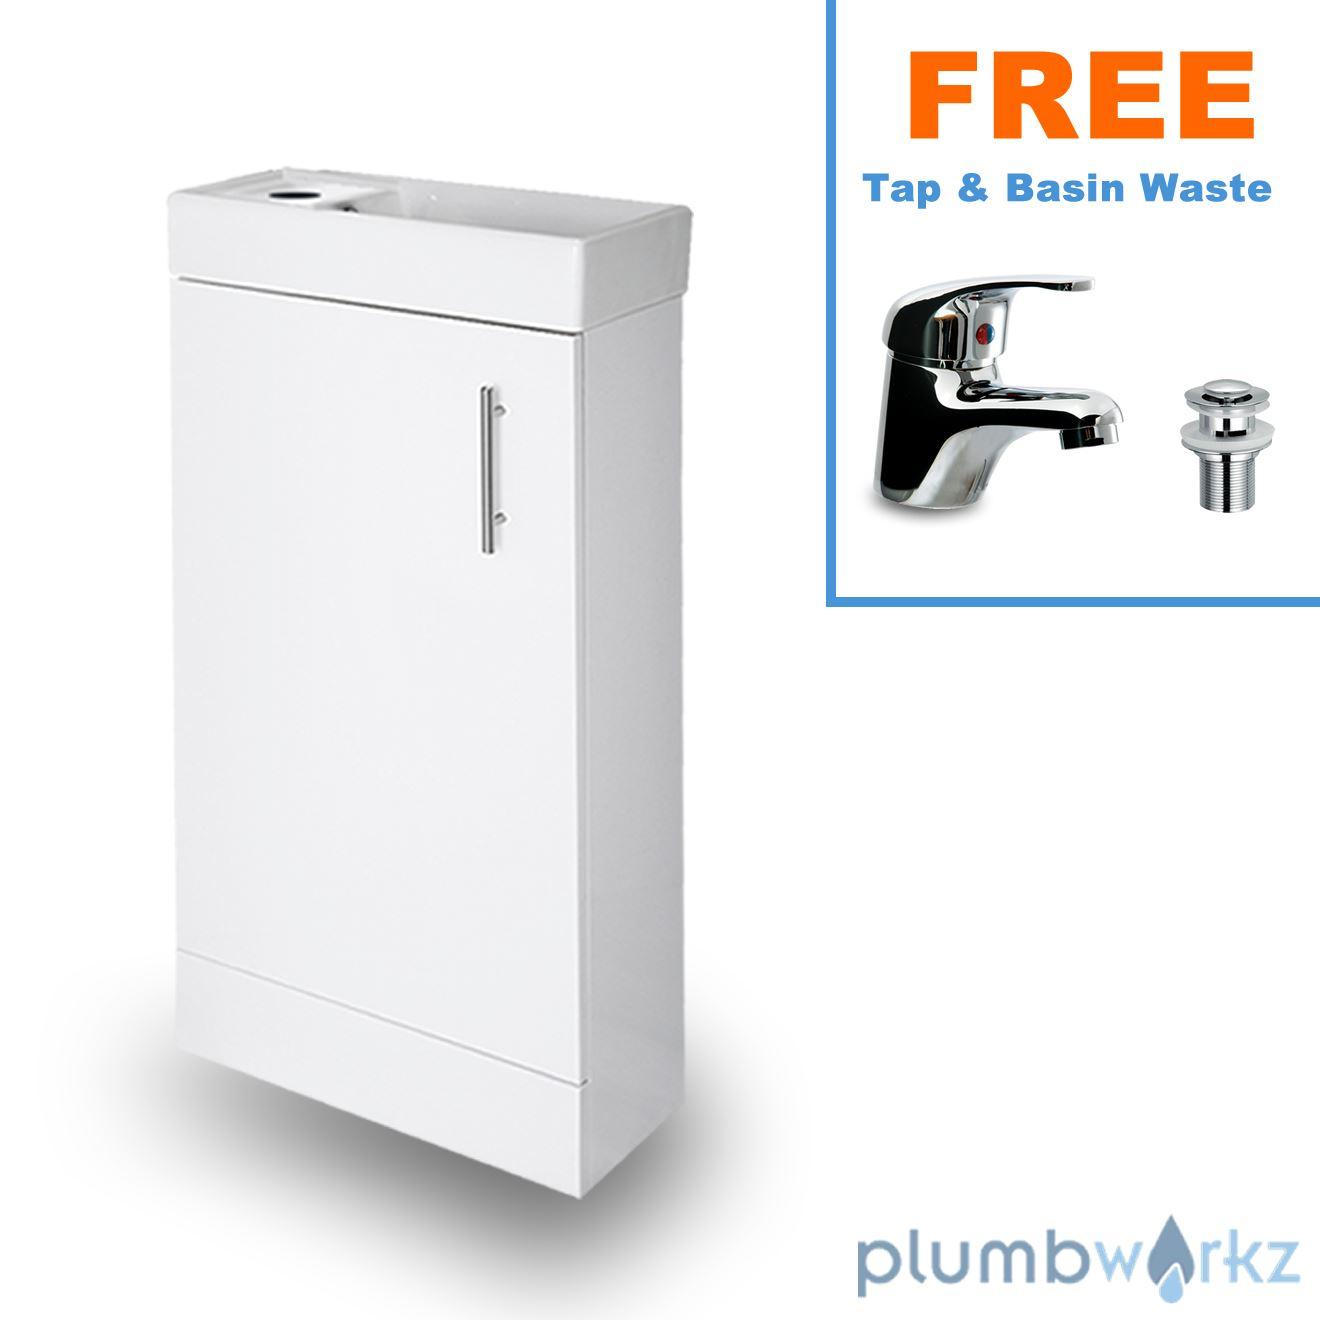 Compact Bathroom Vanity Unit Basin Sink Cloakroom Floor Wall Units With Tap Ebay